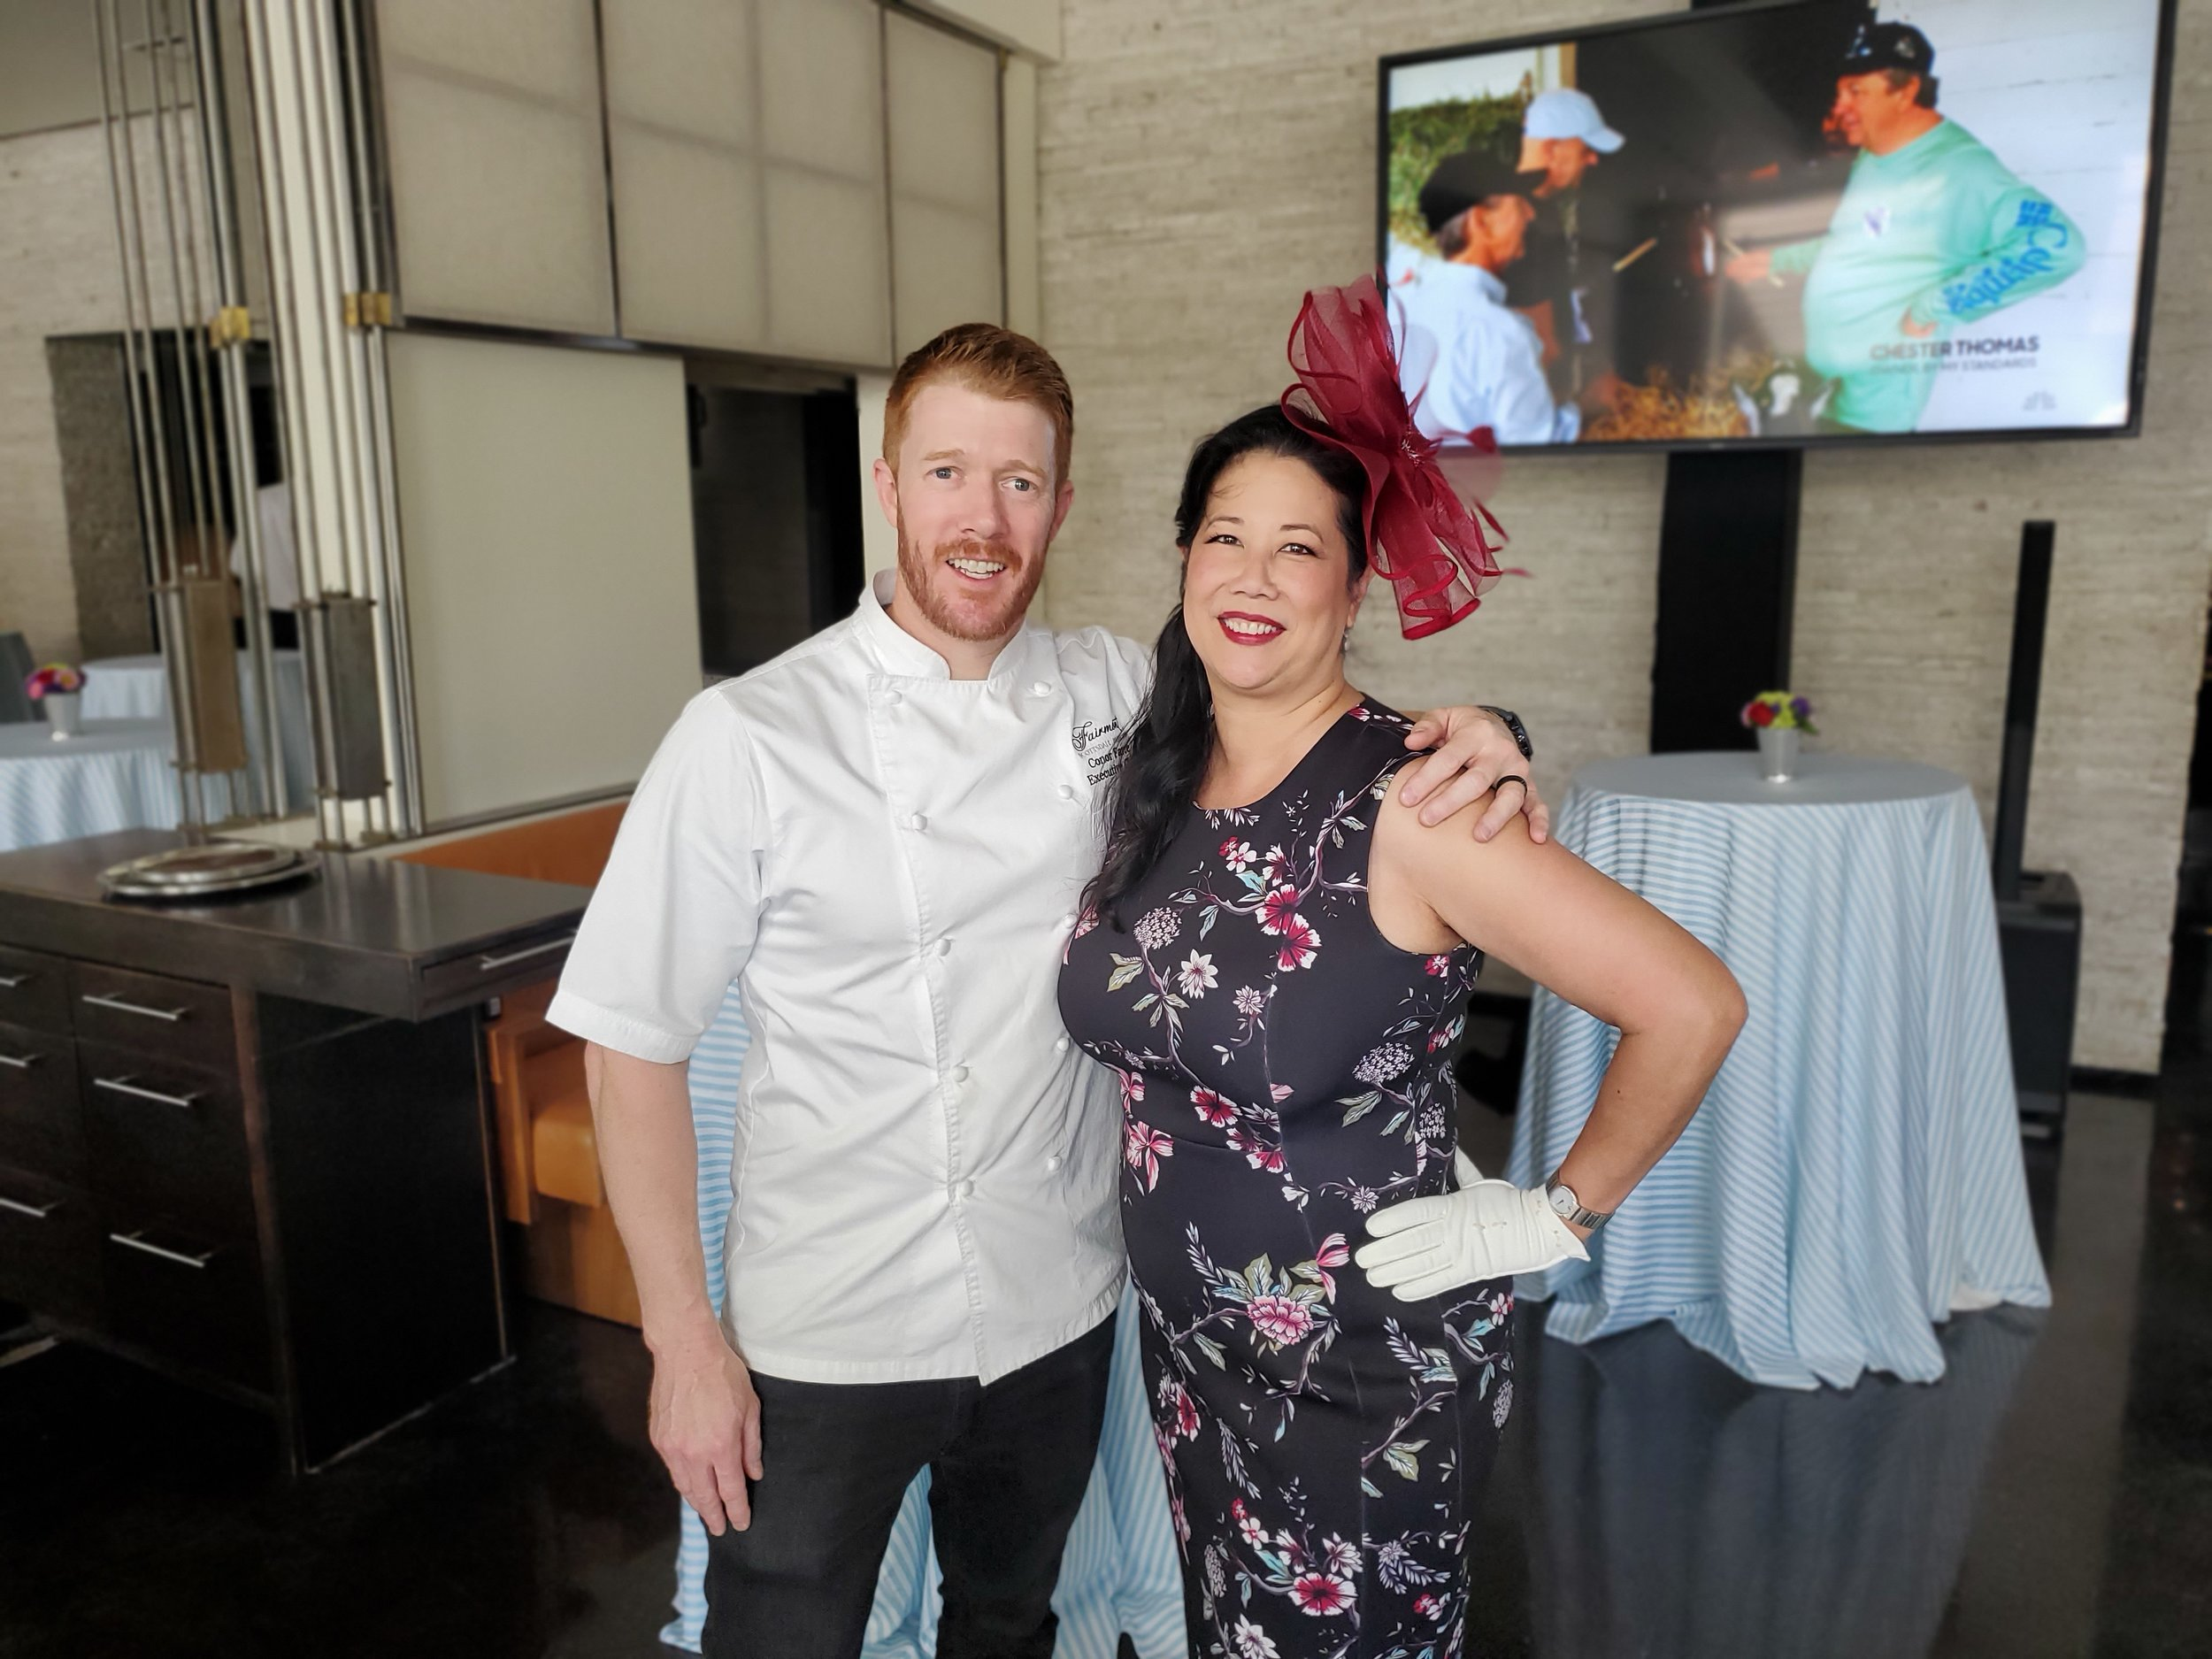 Conor Favre, executive chef of the Scottsdale Fairmont Princess